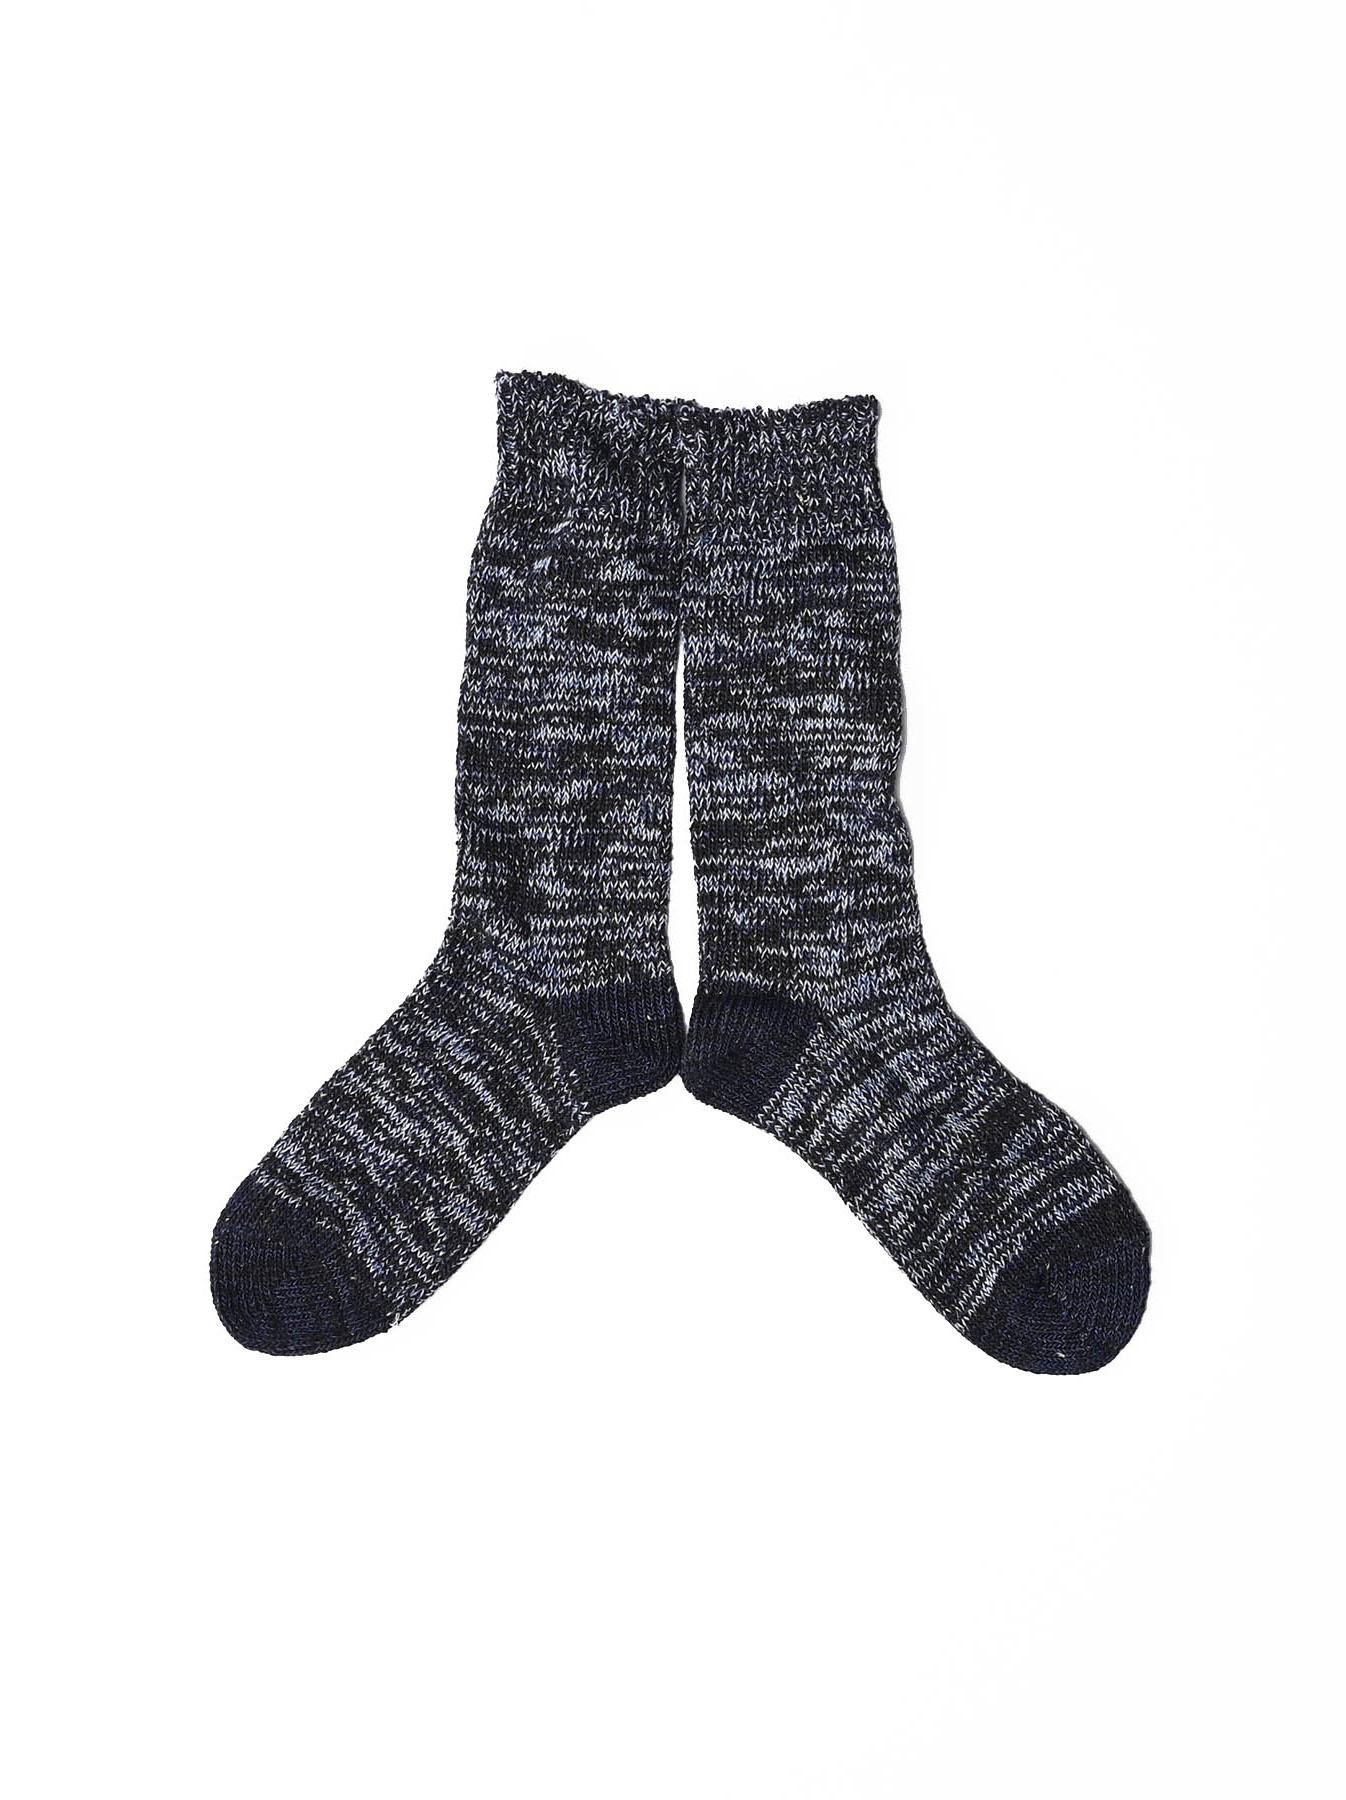 Indigo Mokumoku Socks-2